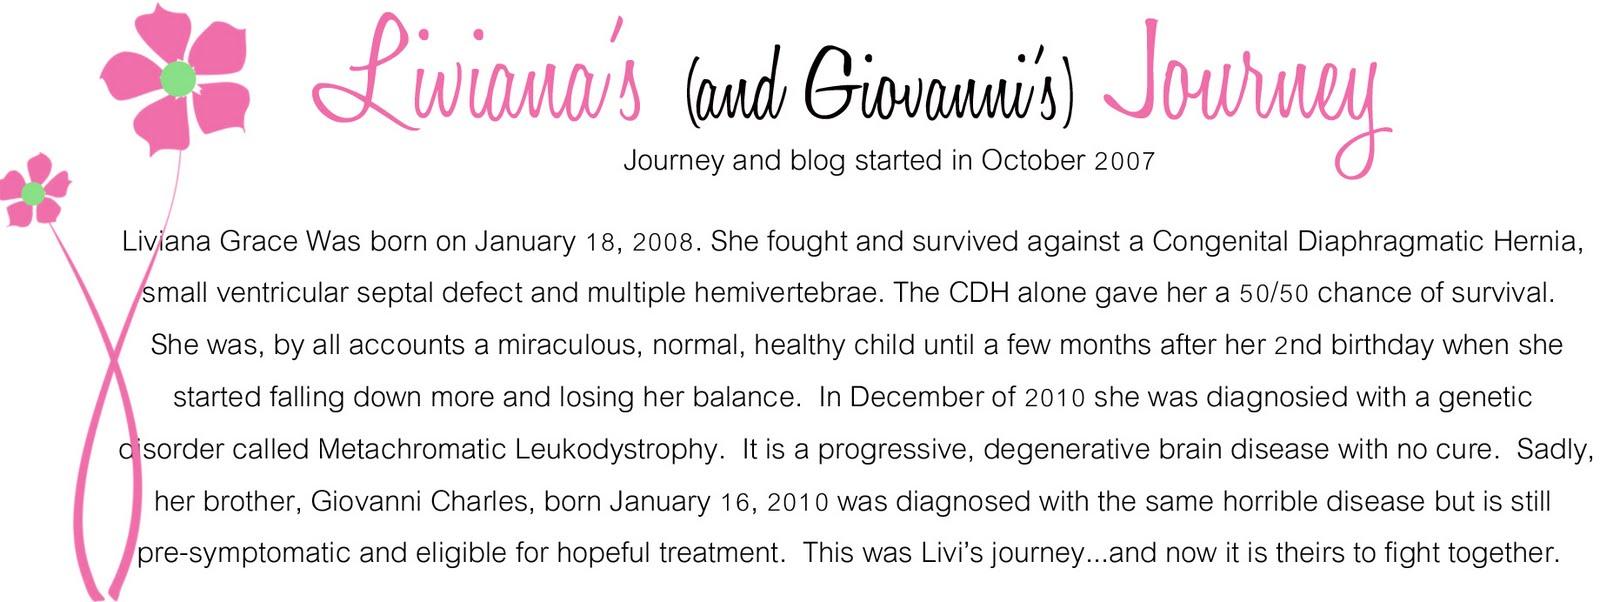 Liviana's Journey